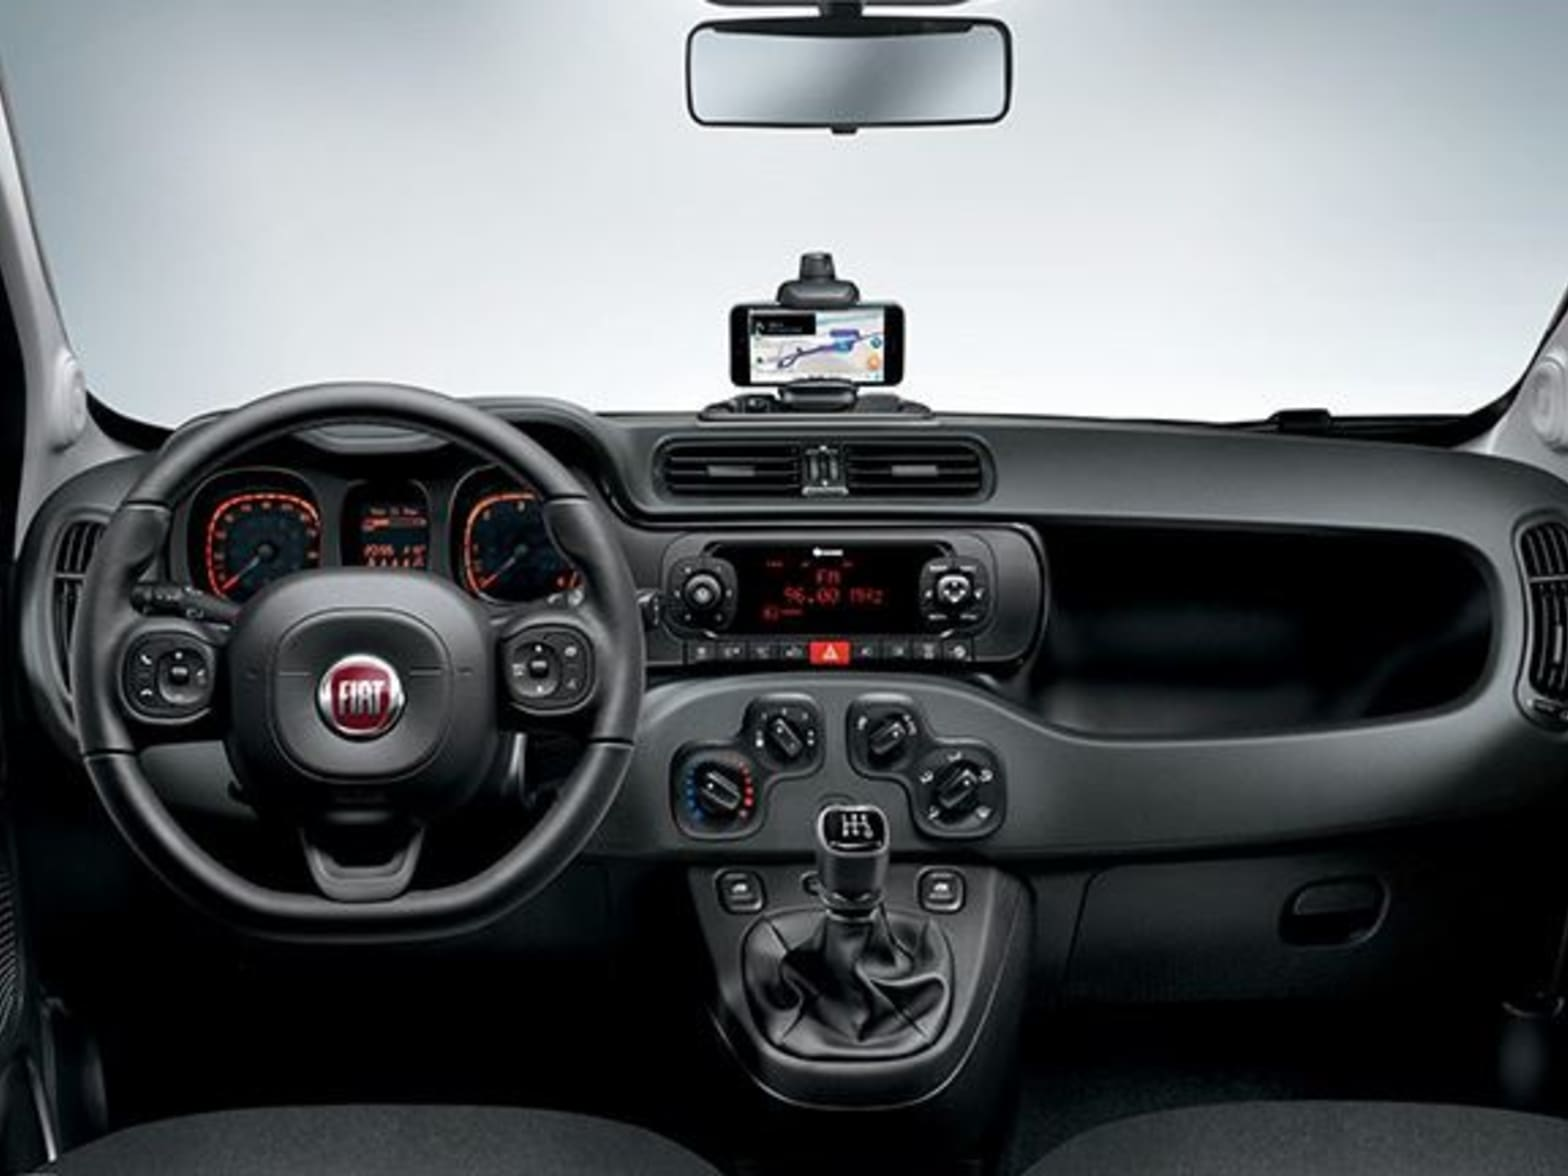 Fiat Panda Waze 4X4   Westover Fiat